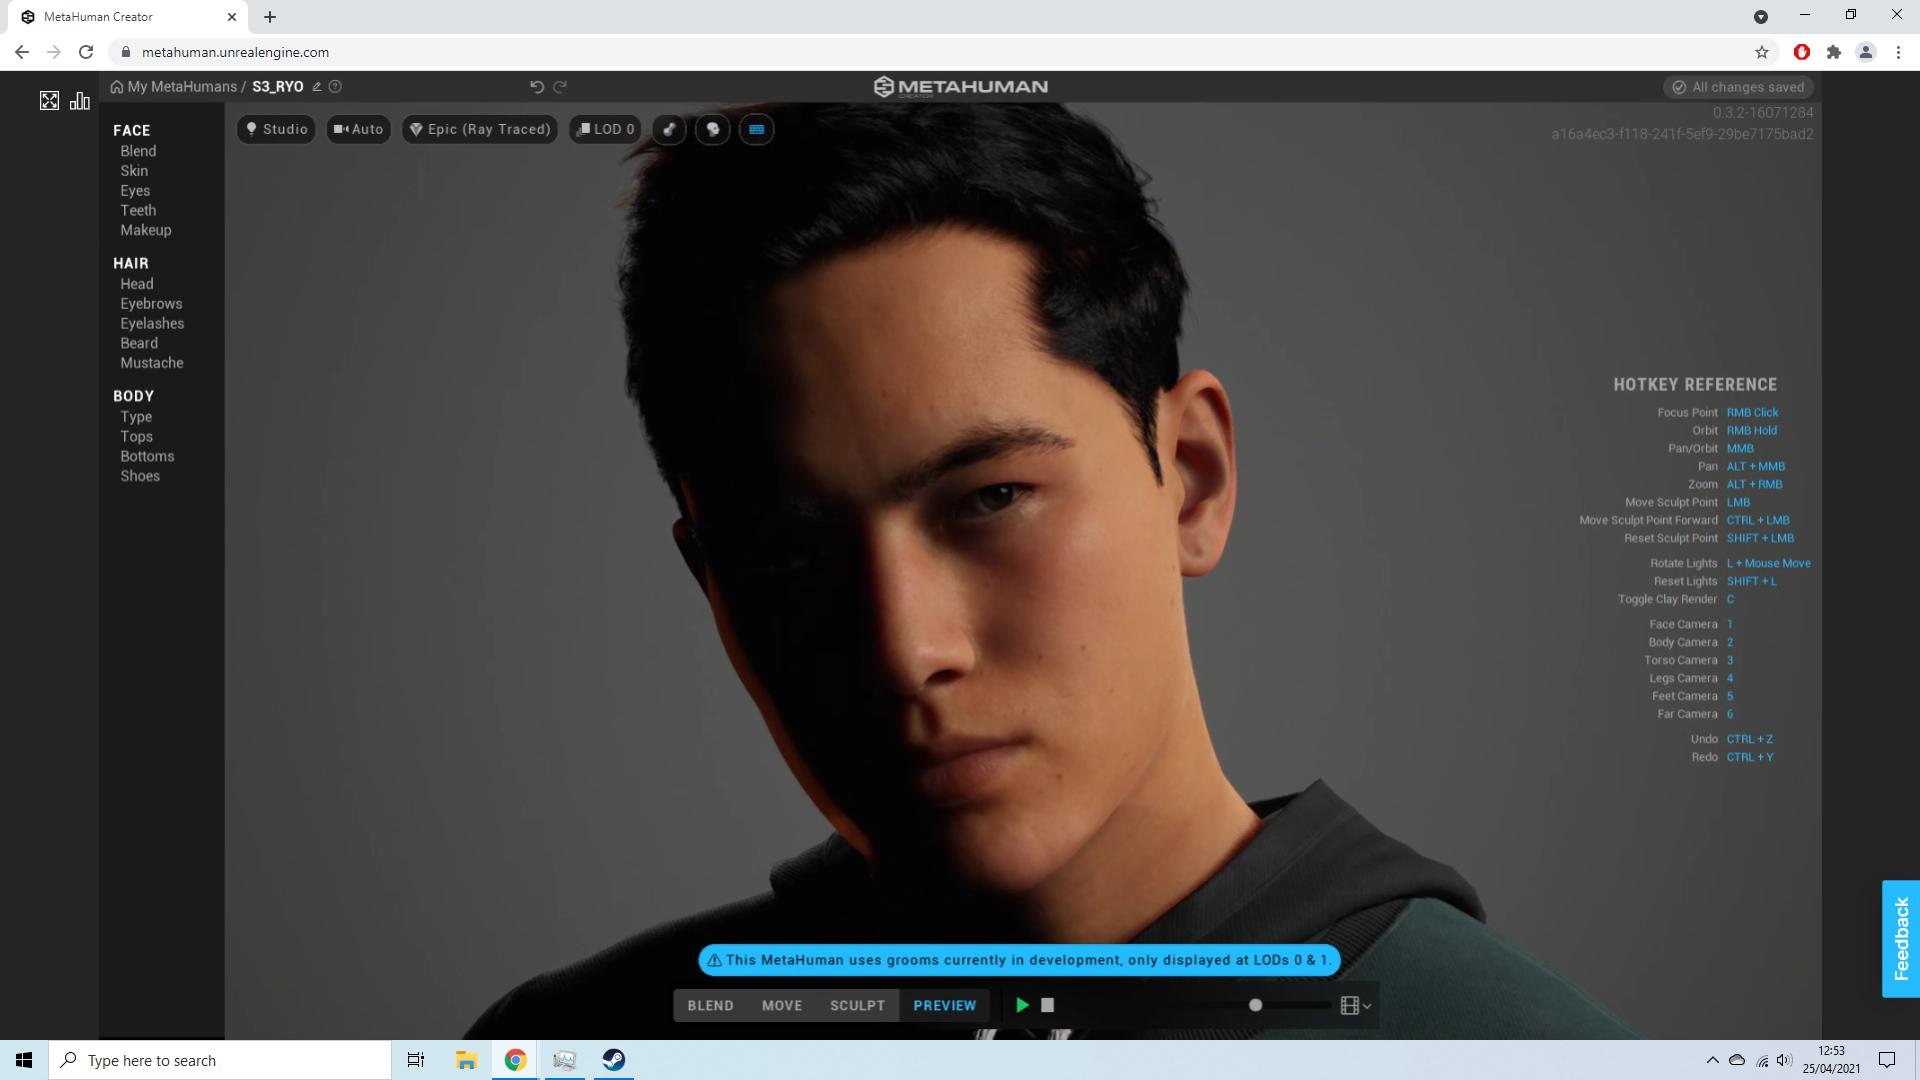 desktopscreenshot20215zj7u.png